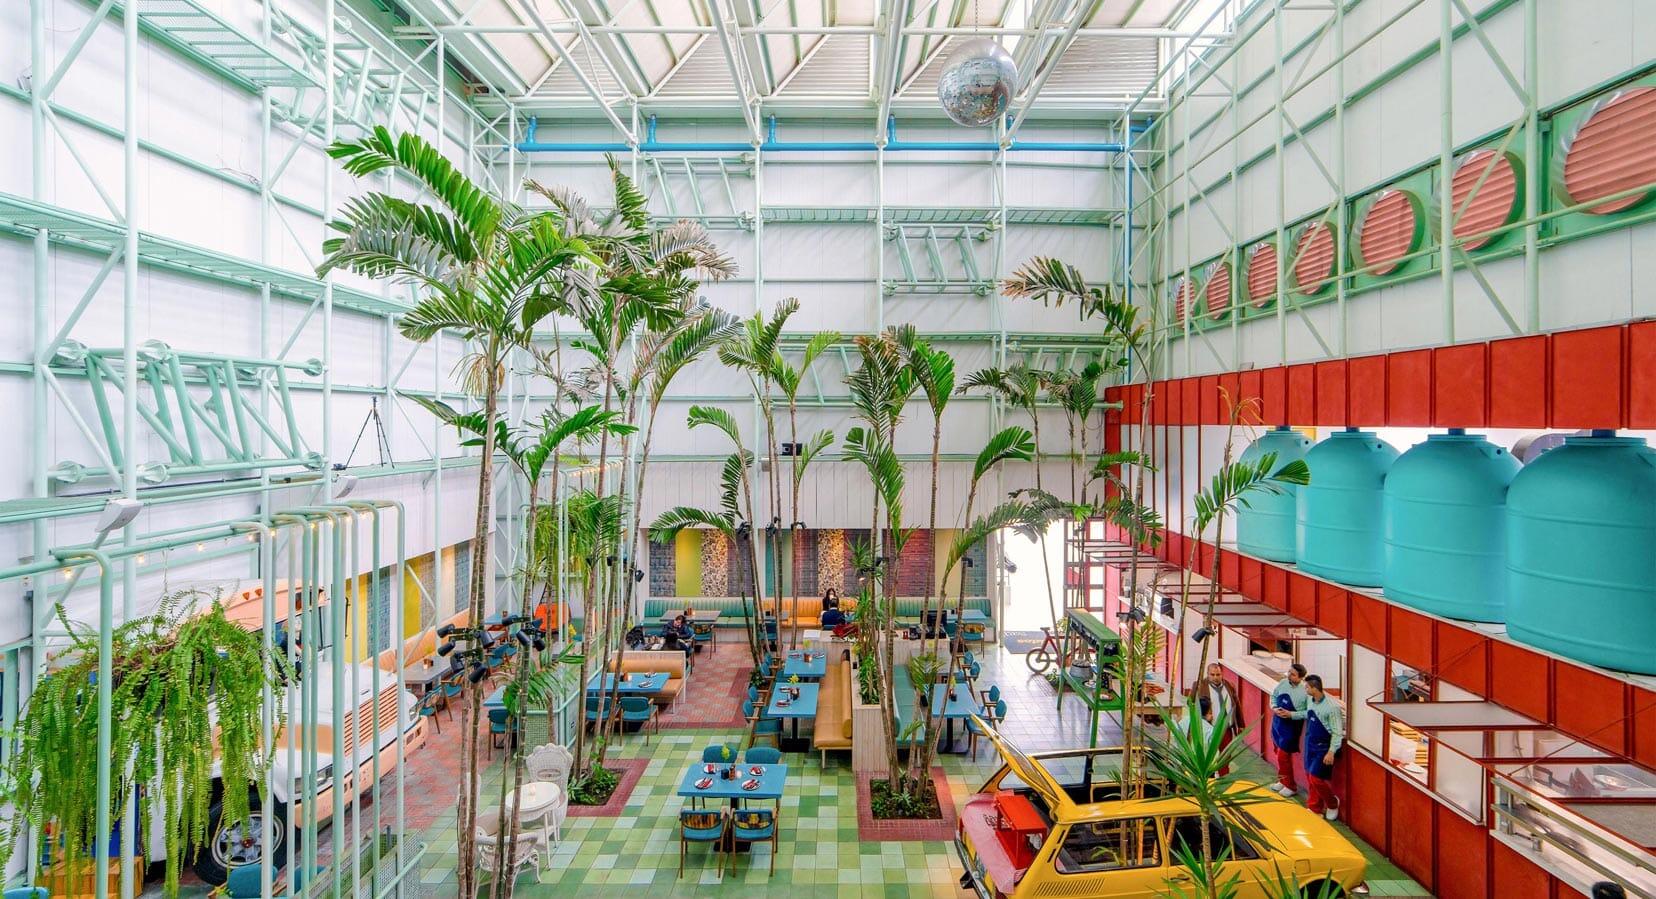 An Urban Oasis: Taller Ken Transforms Madero Café with Tropical Plants & Vintage Cars